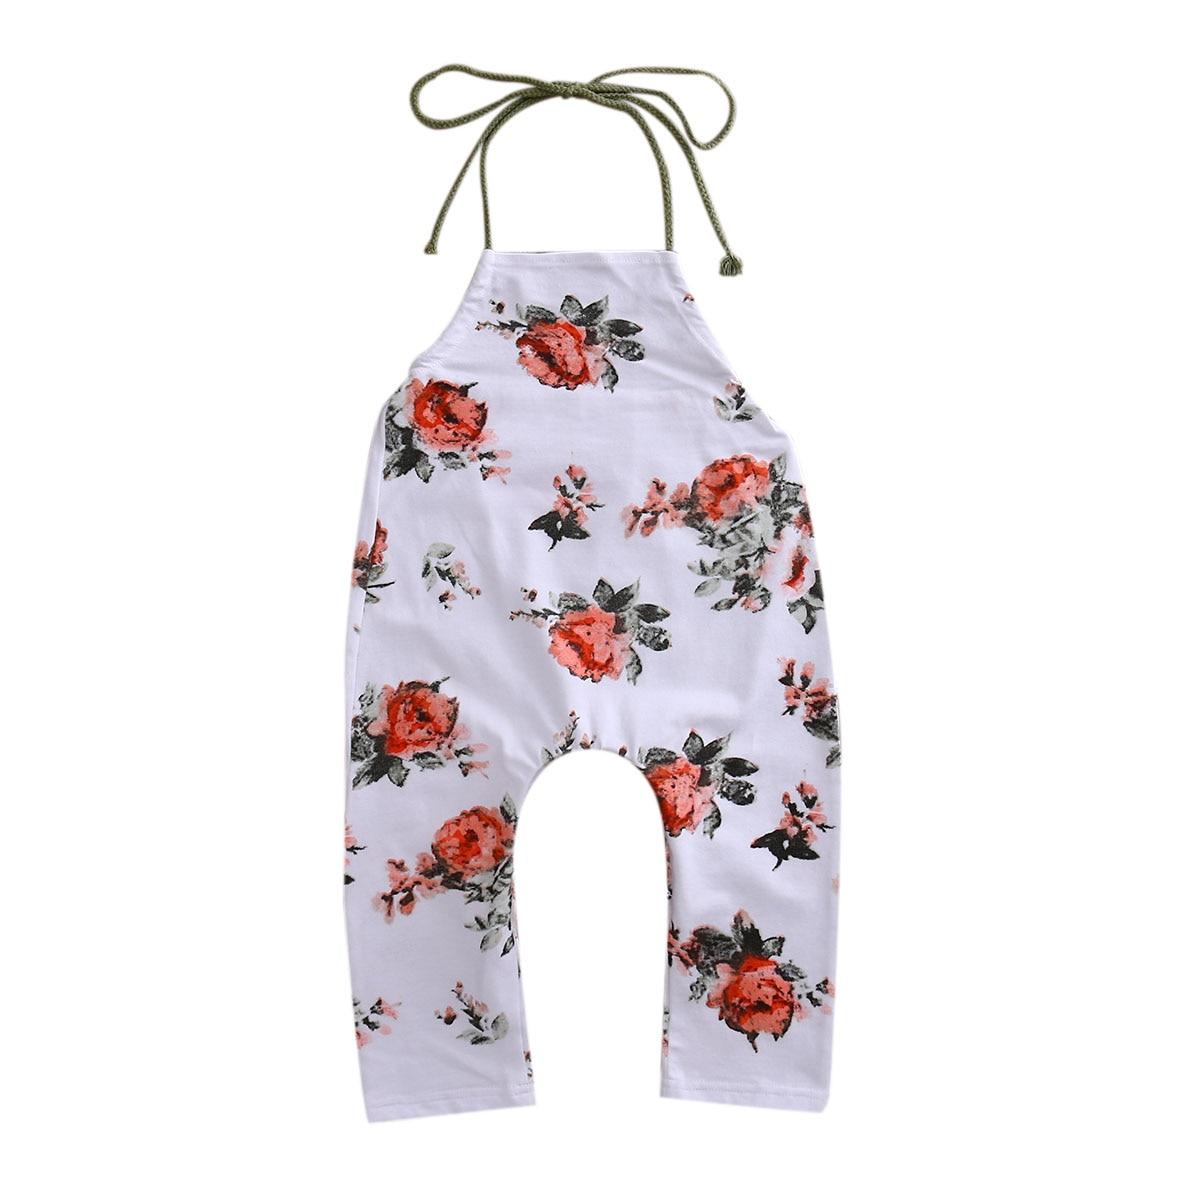 Lovely Summer Toddler Baby Kids Girls  Flower Romper Sleeveless Floral Belt Cotton Clothing  Lace up Jumpsuit